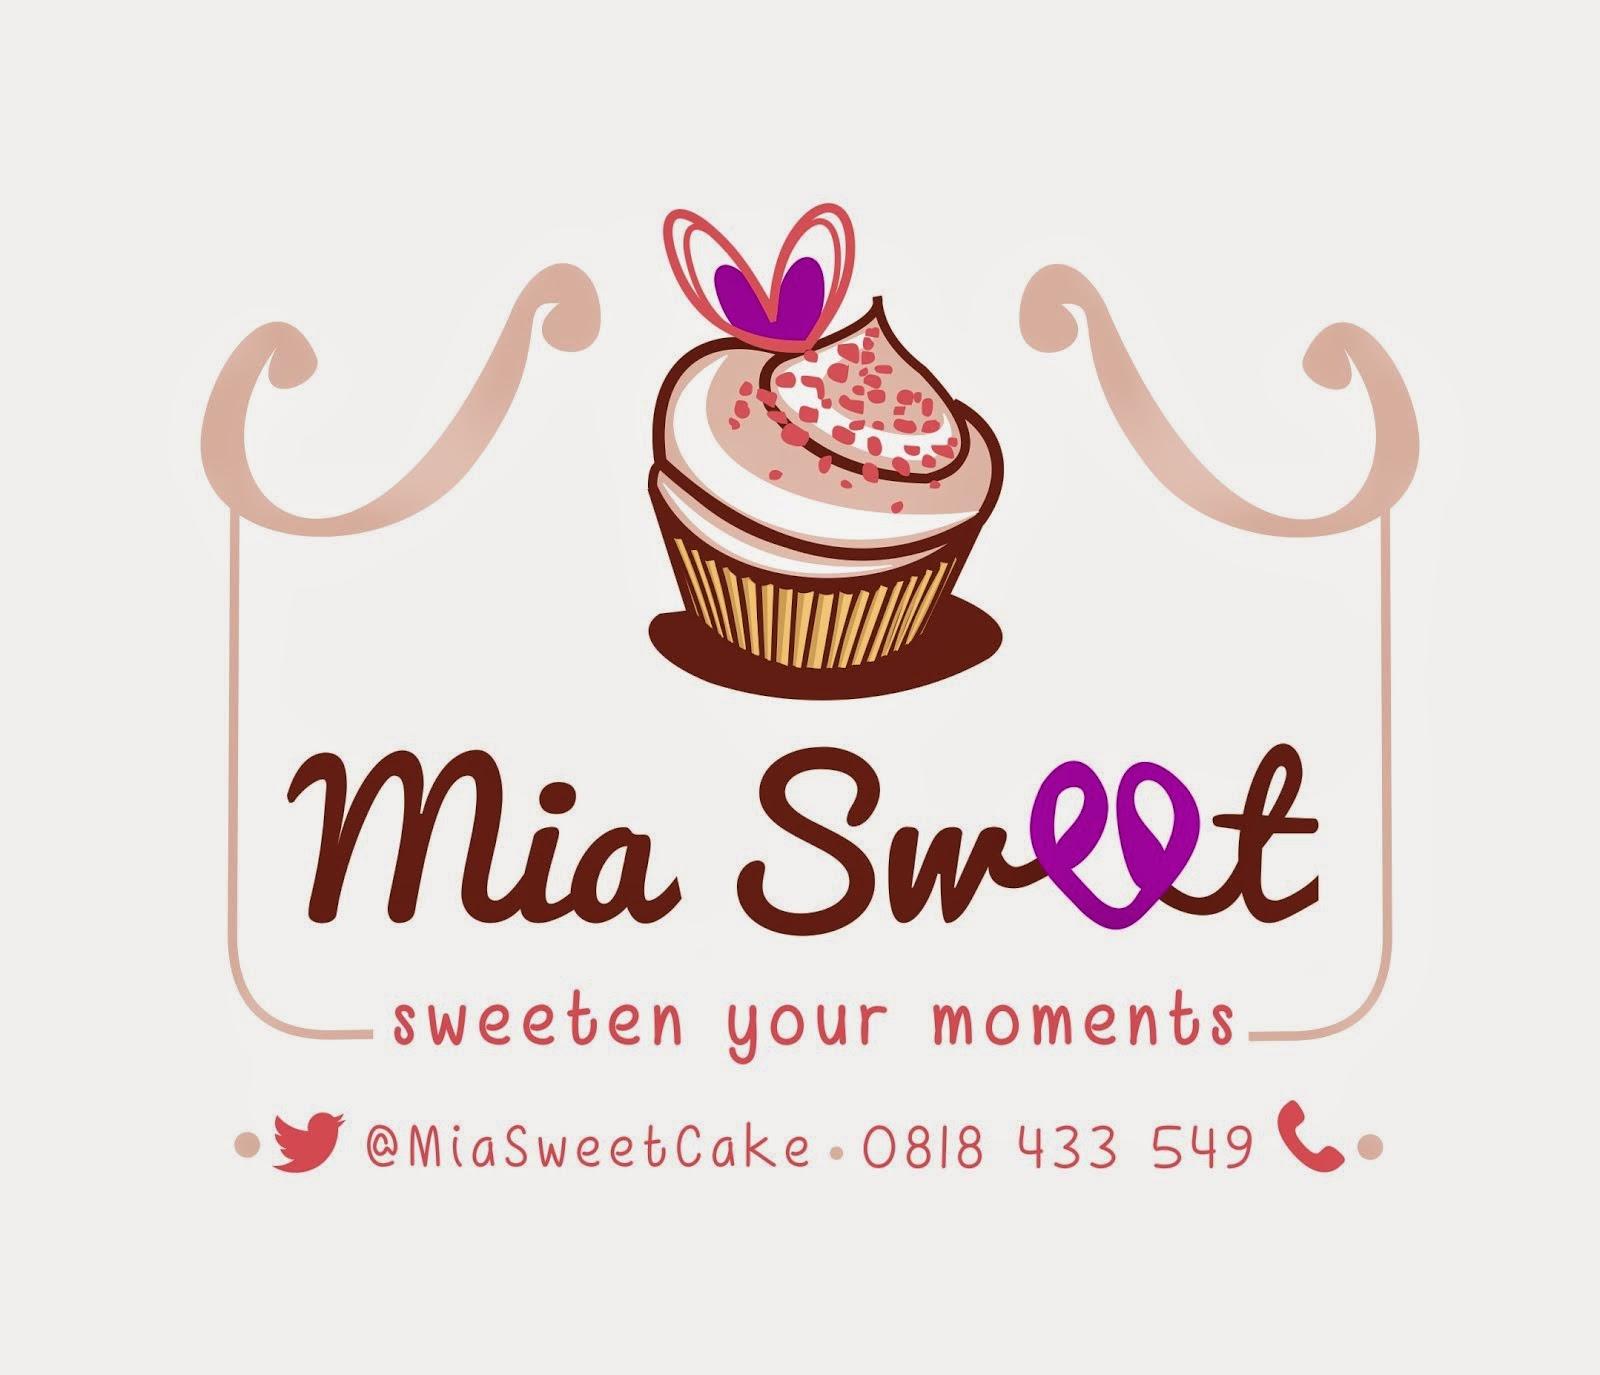 Mia Sweet